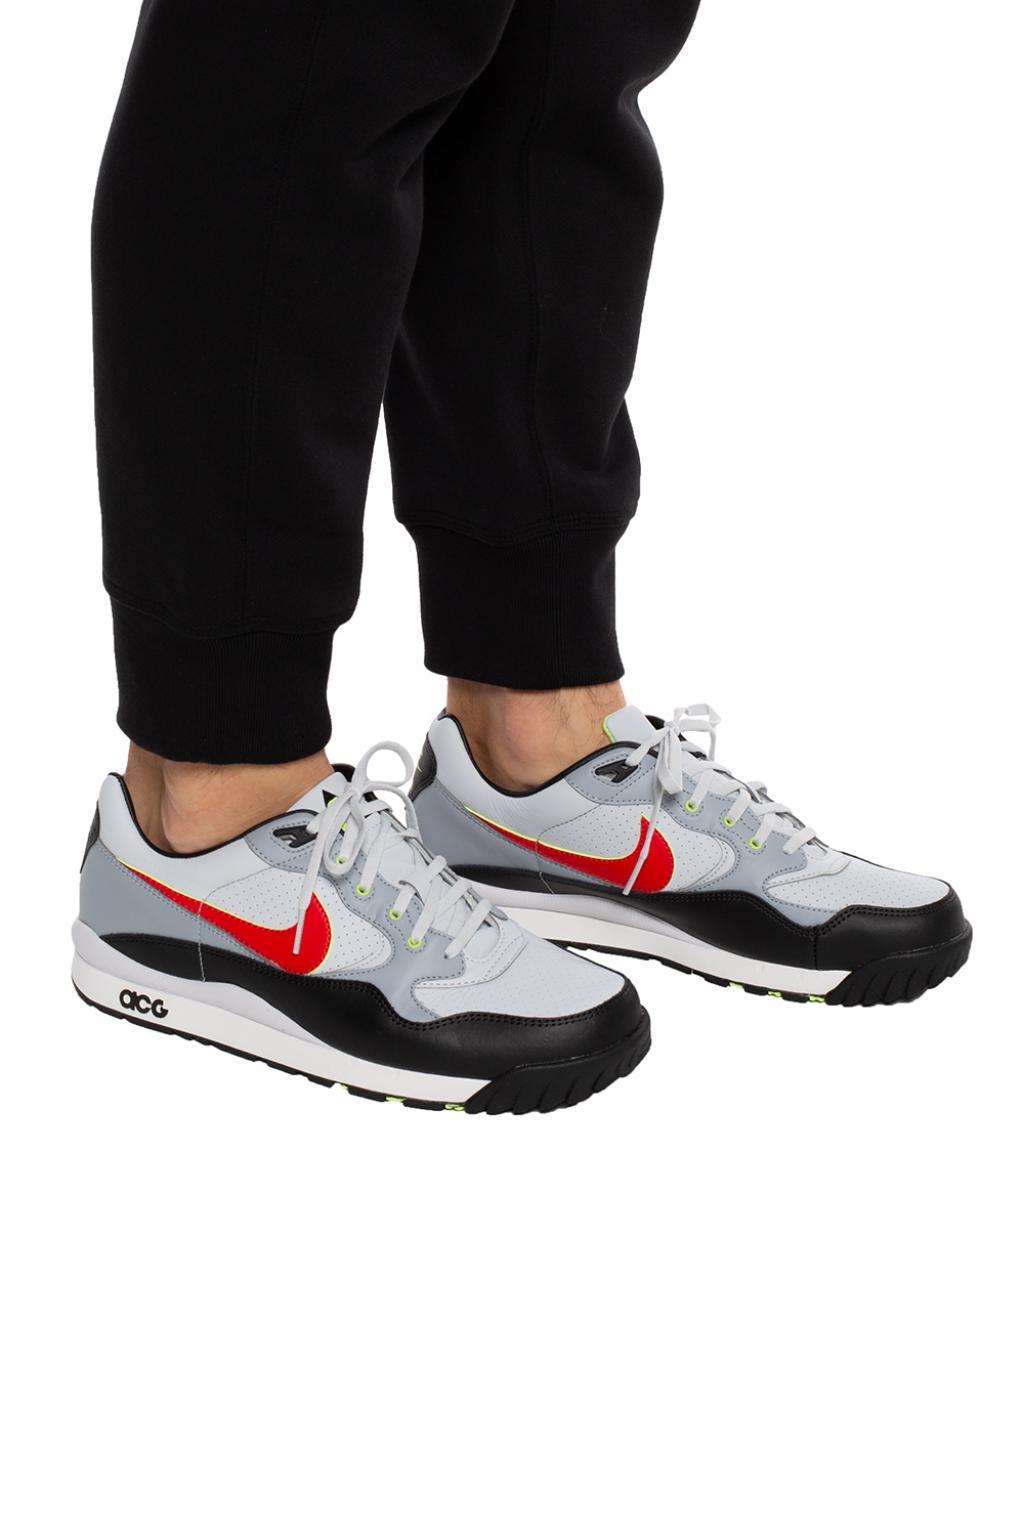 áspero Convencional barajar  Wildwood ACG' sneakers Nike - Vitkac Italy